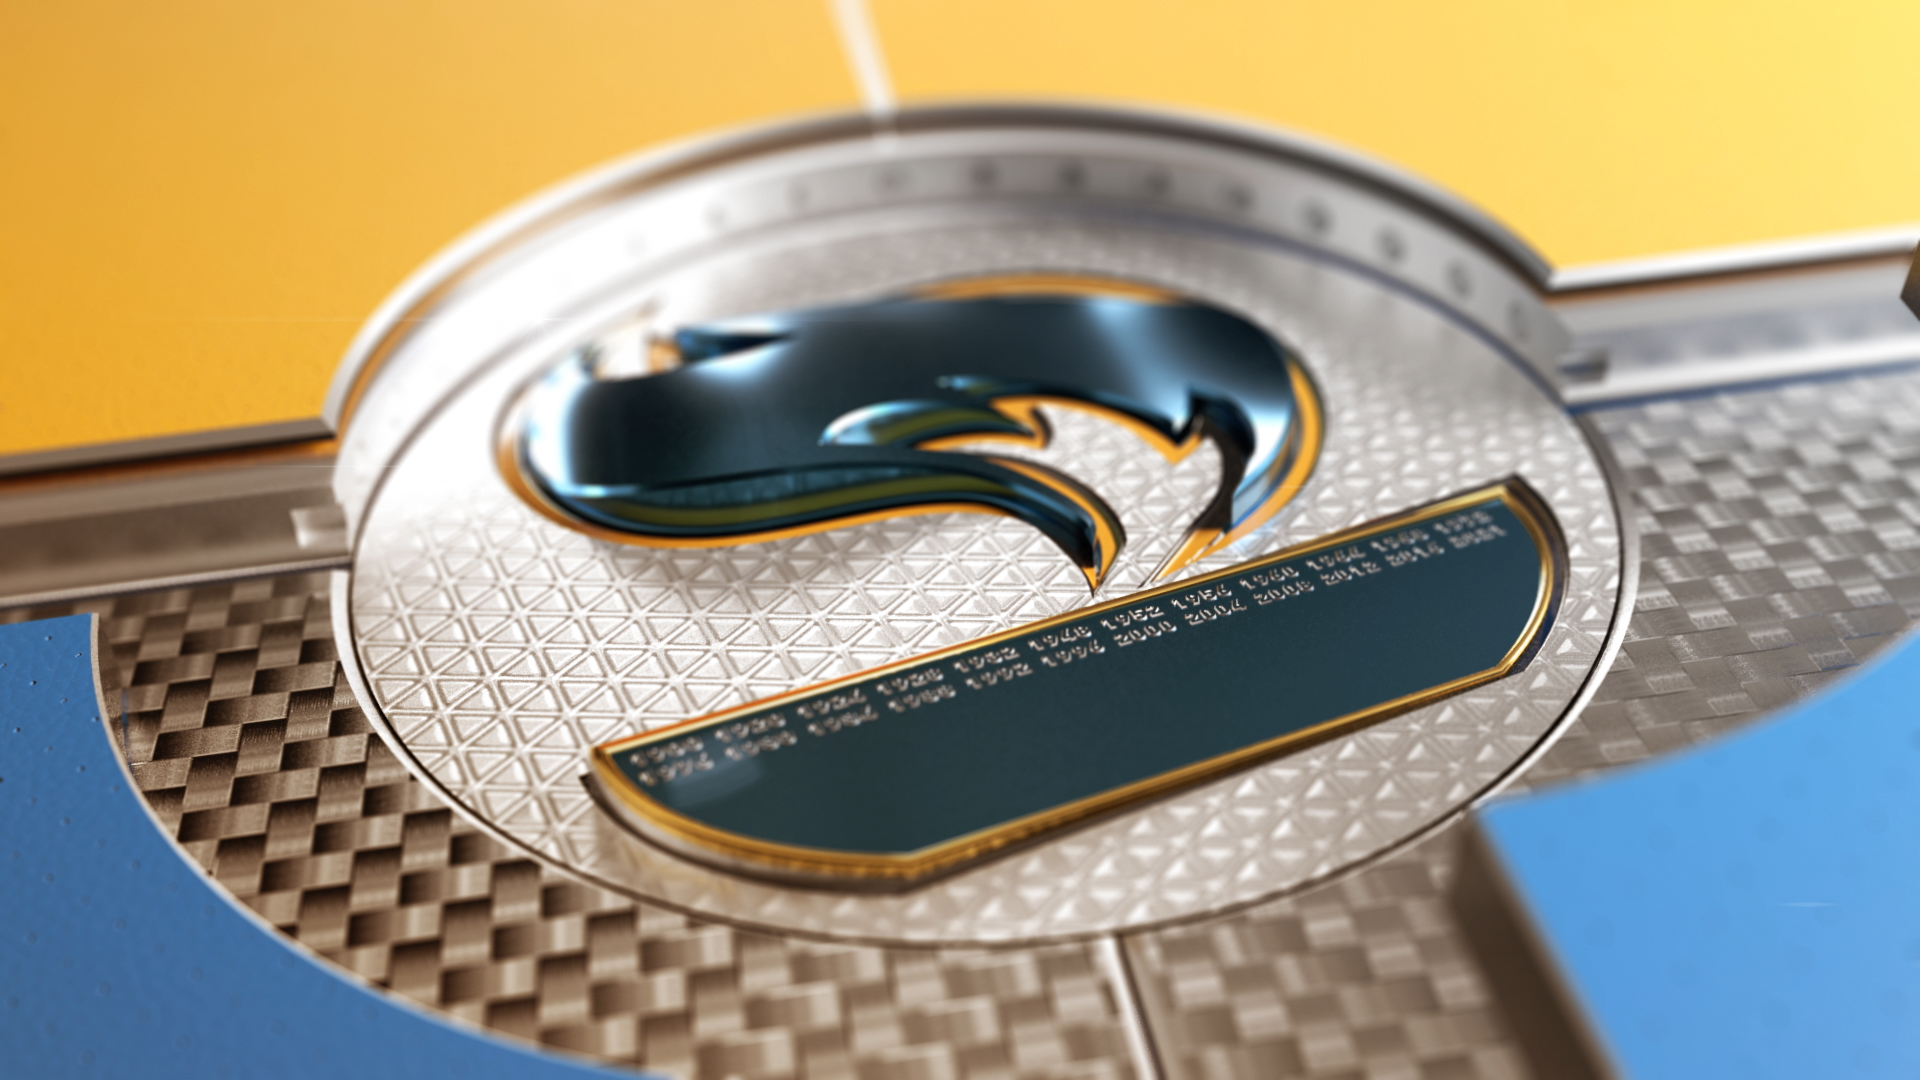 branding-cabecera-orgullo-de-medalla-olimpiadas-1-rtve-1920x1080-1.jpg